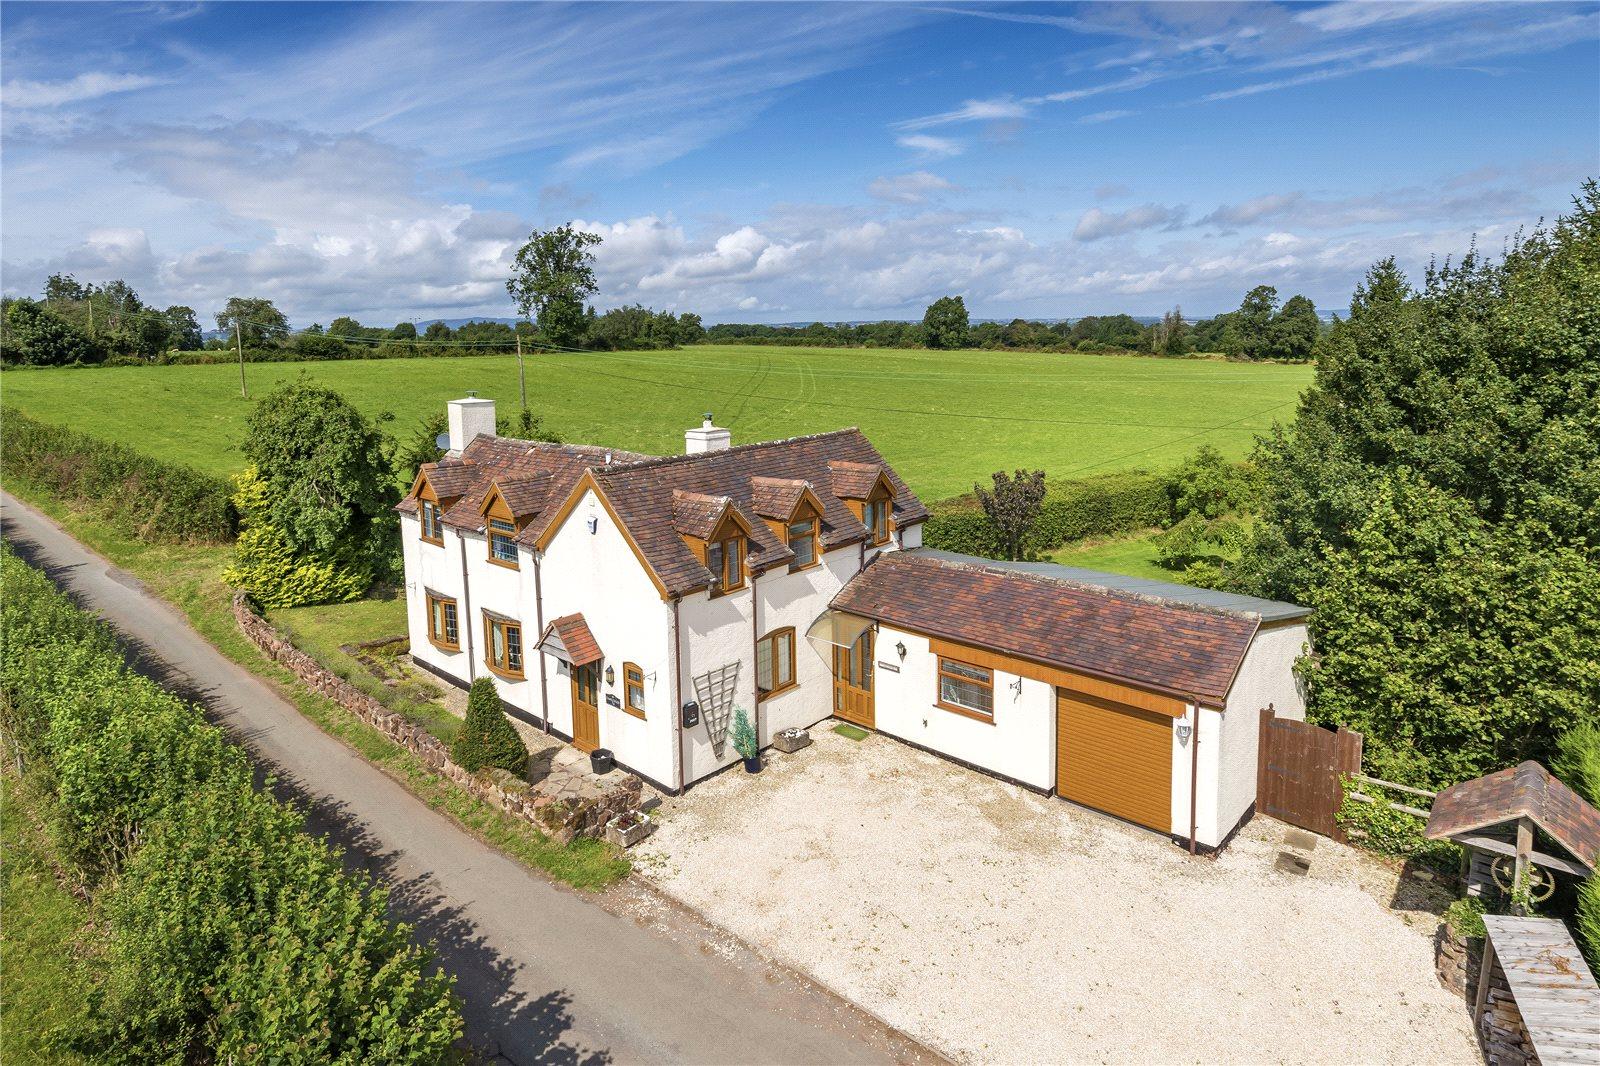 Tumbleweed Cottage, 76 Lowe Lane, Alveley, Bridgnorth, Shropshire, WV15